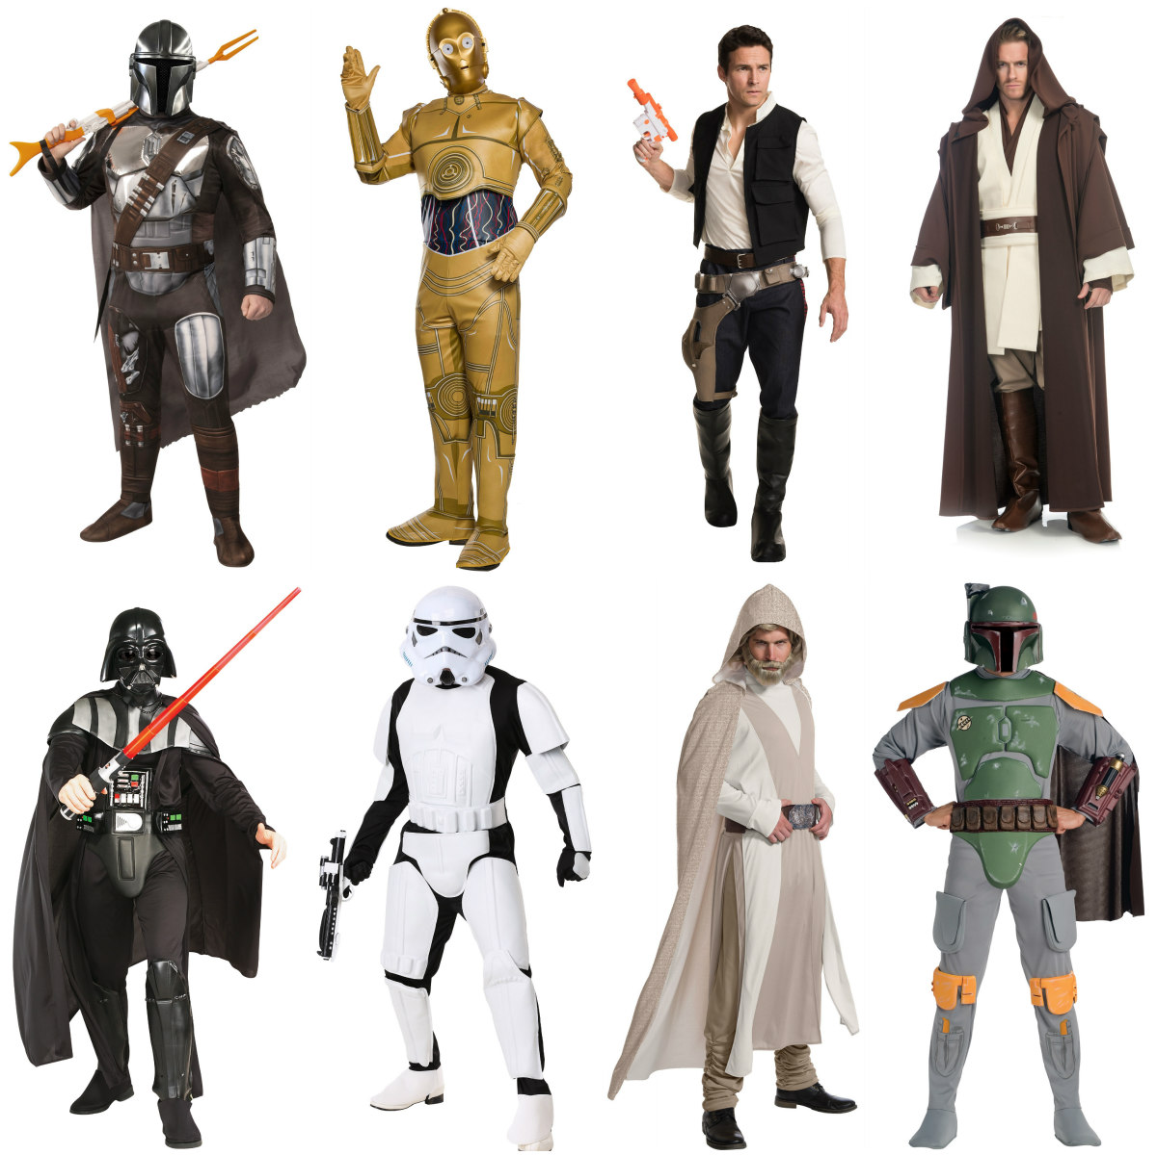 The Top 10 Comic Con Costume Ideas Halloweencostumes Com Blog